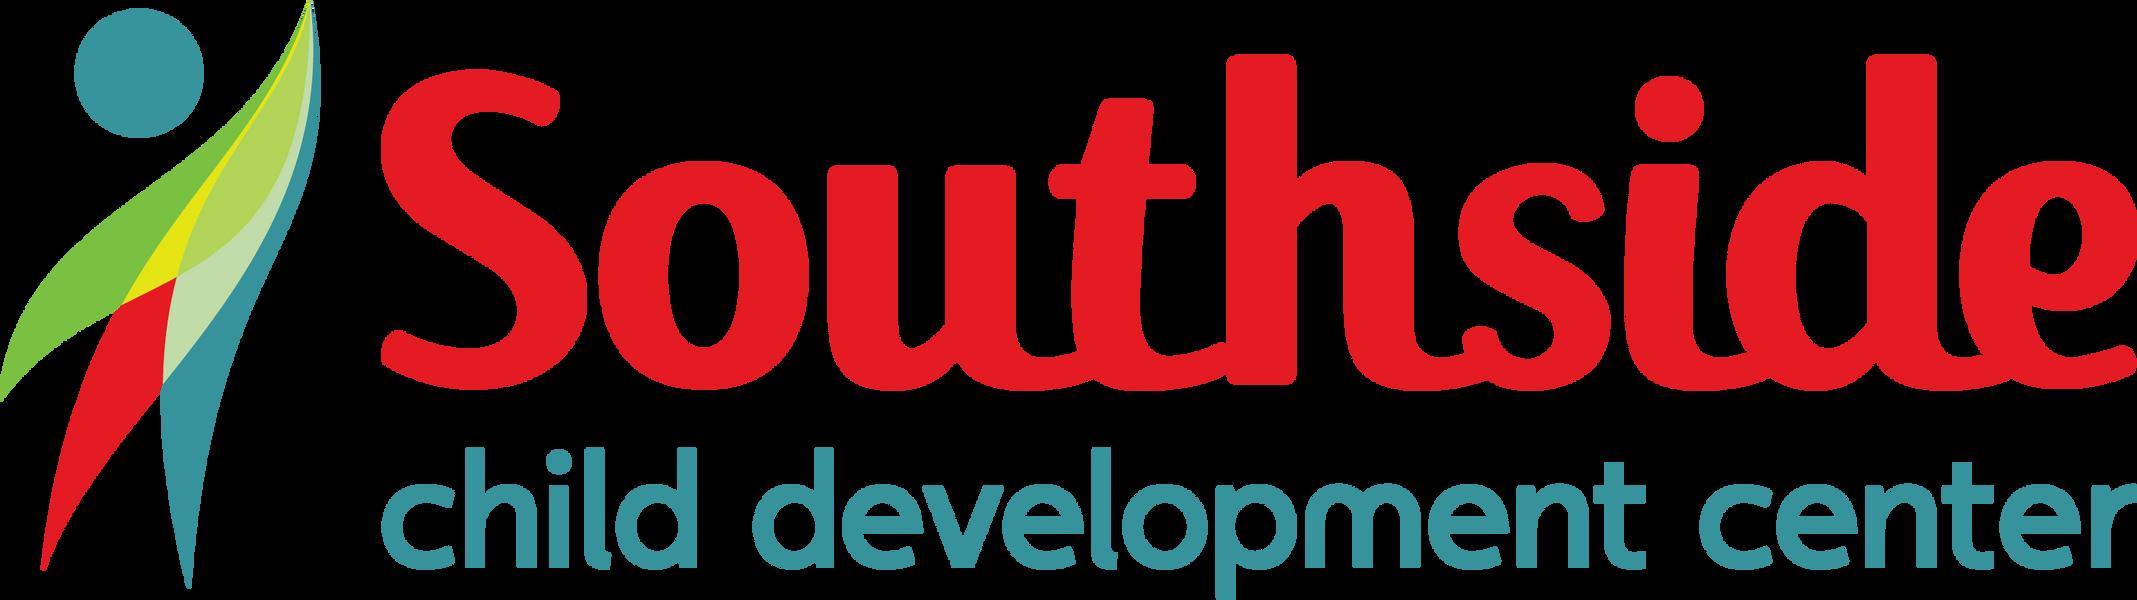 Southside Child Development Center Logo